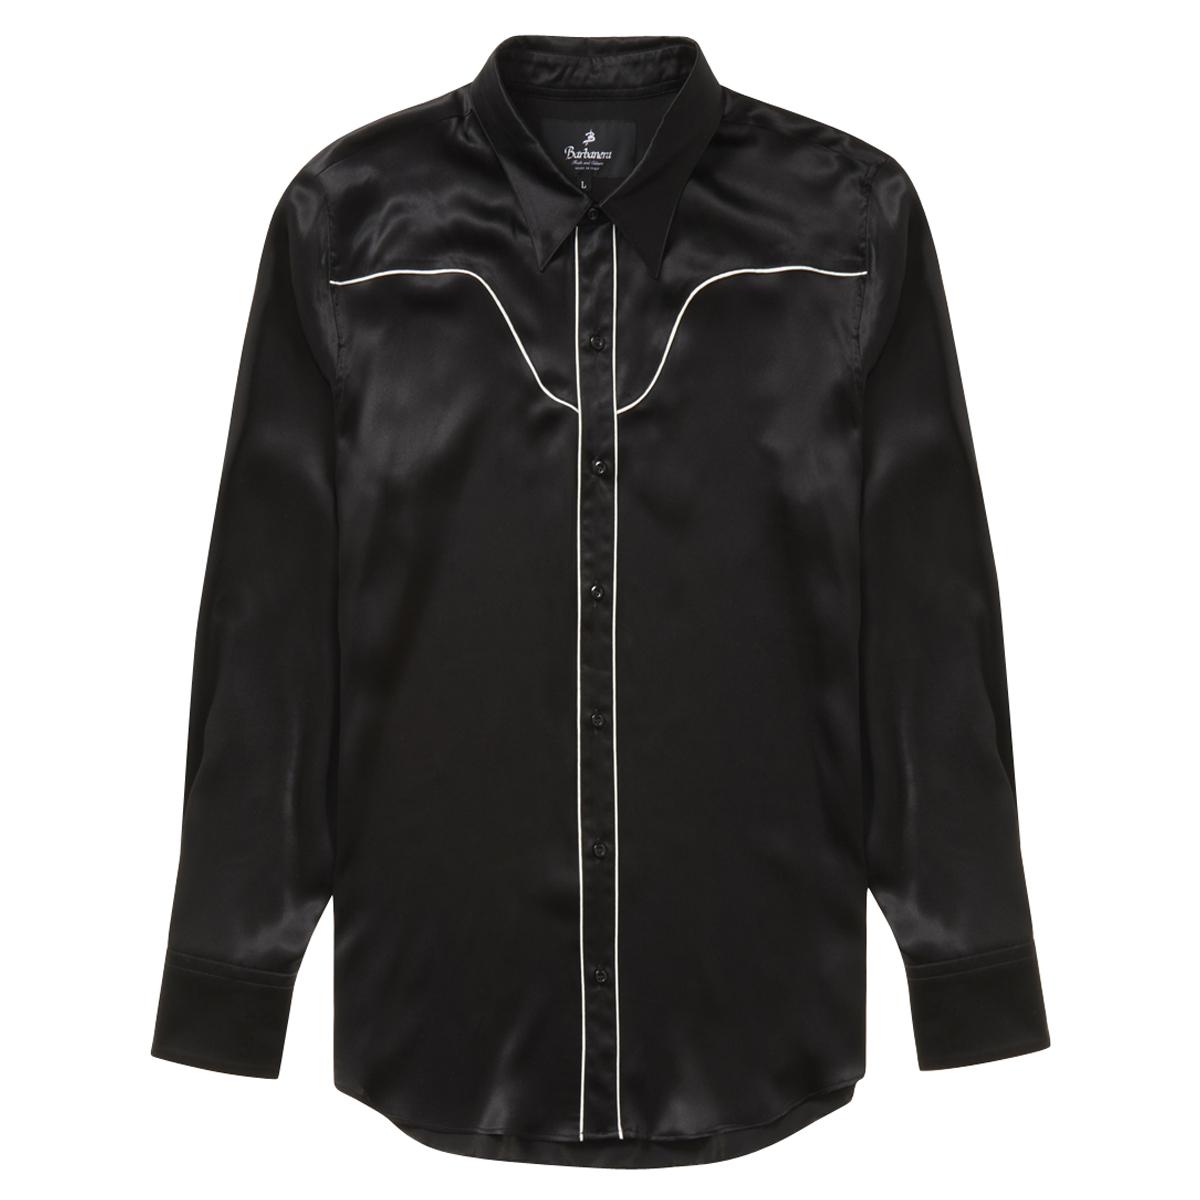 Mustang Black Silk Vintage-Inspired Western Shirt